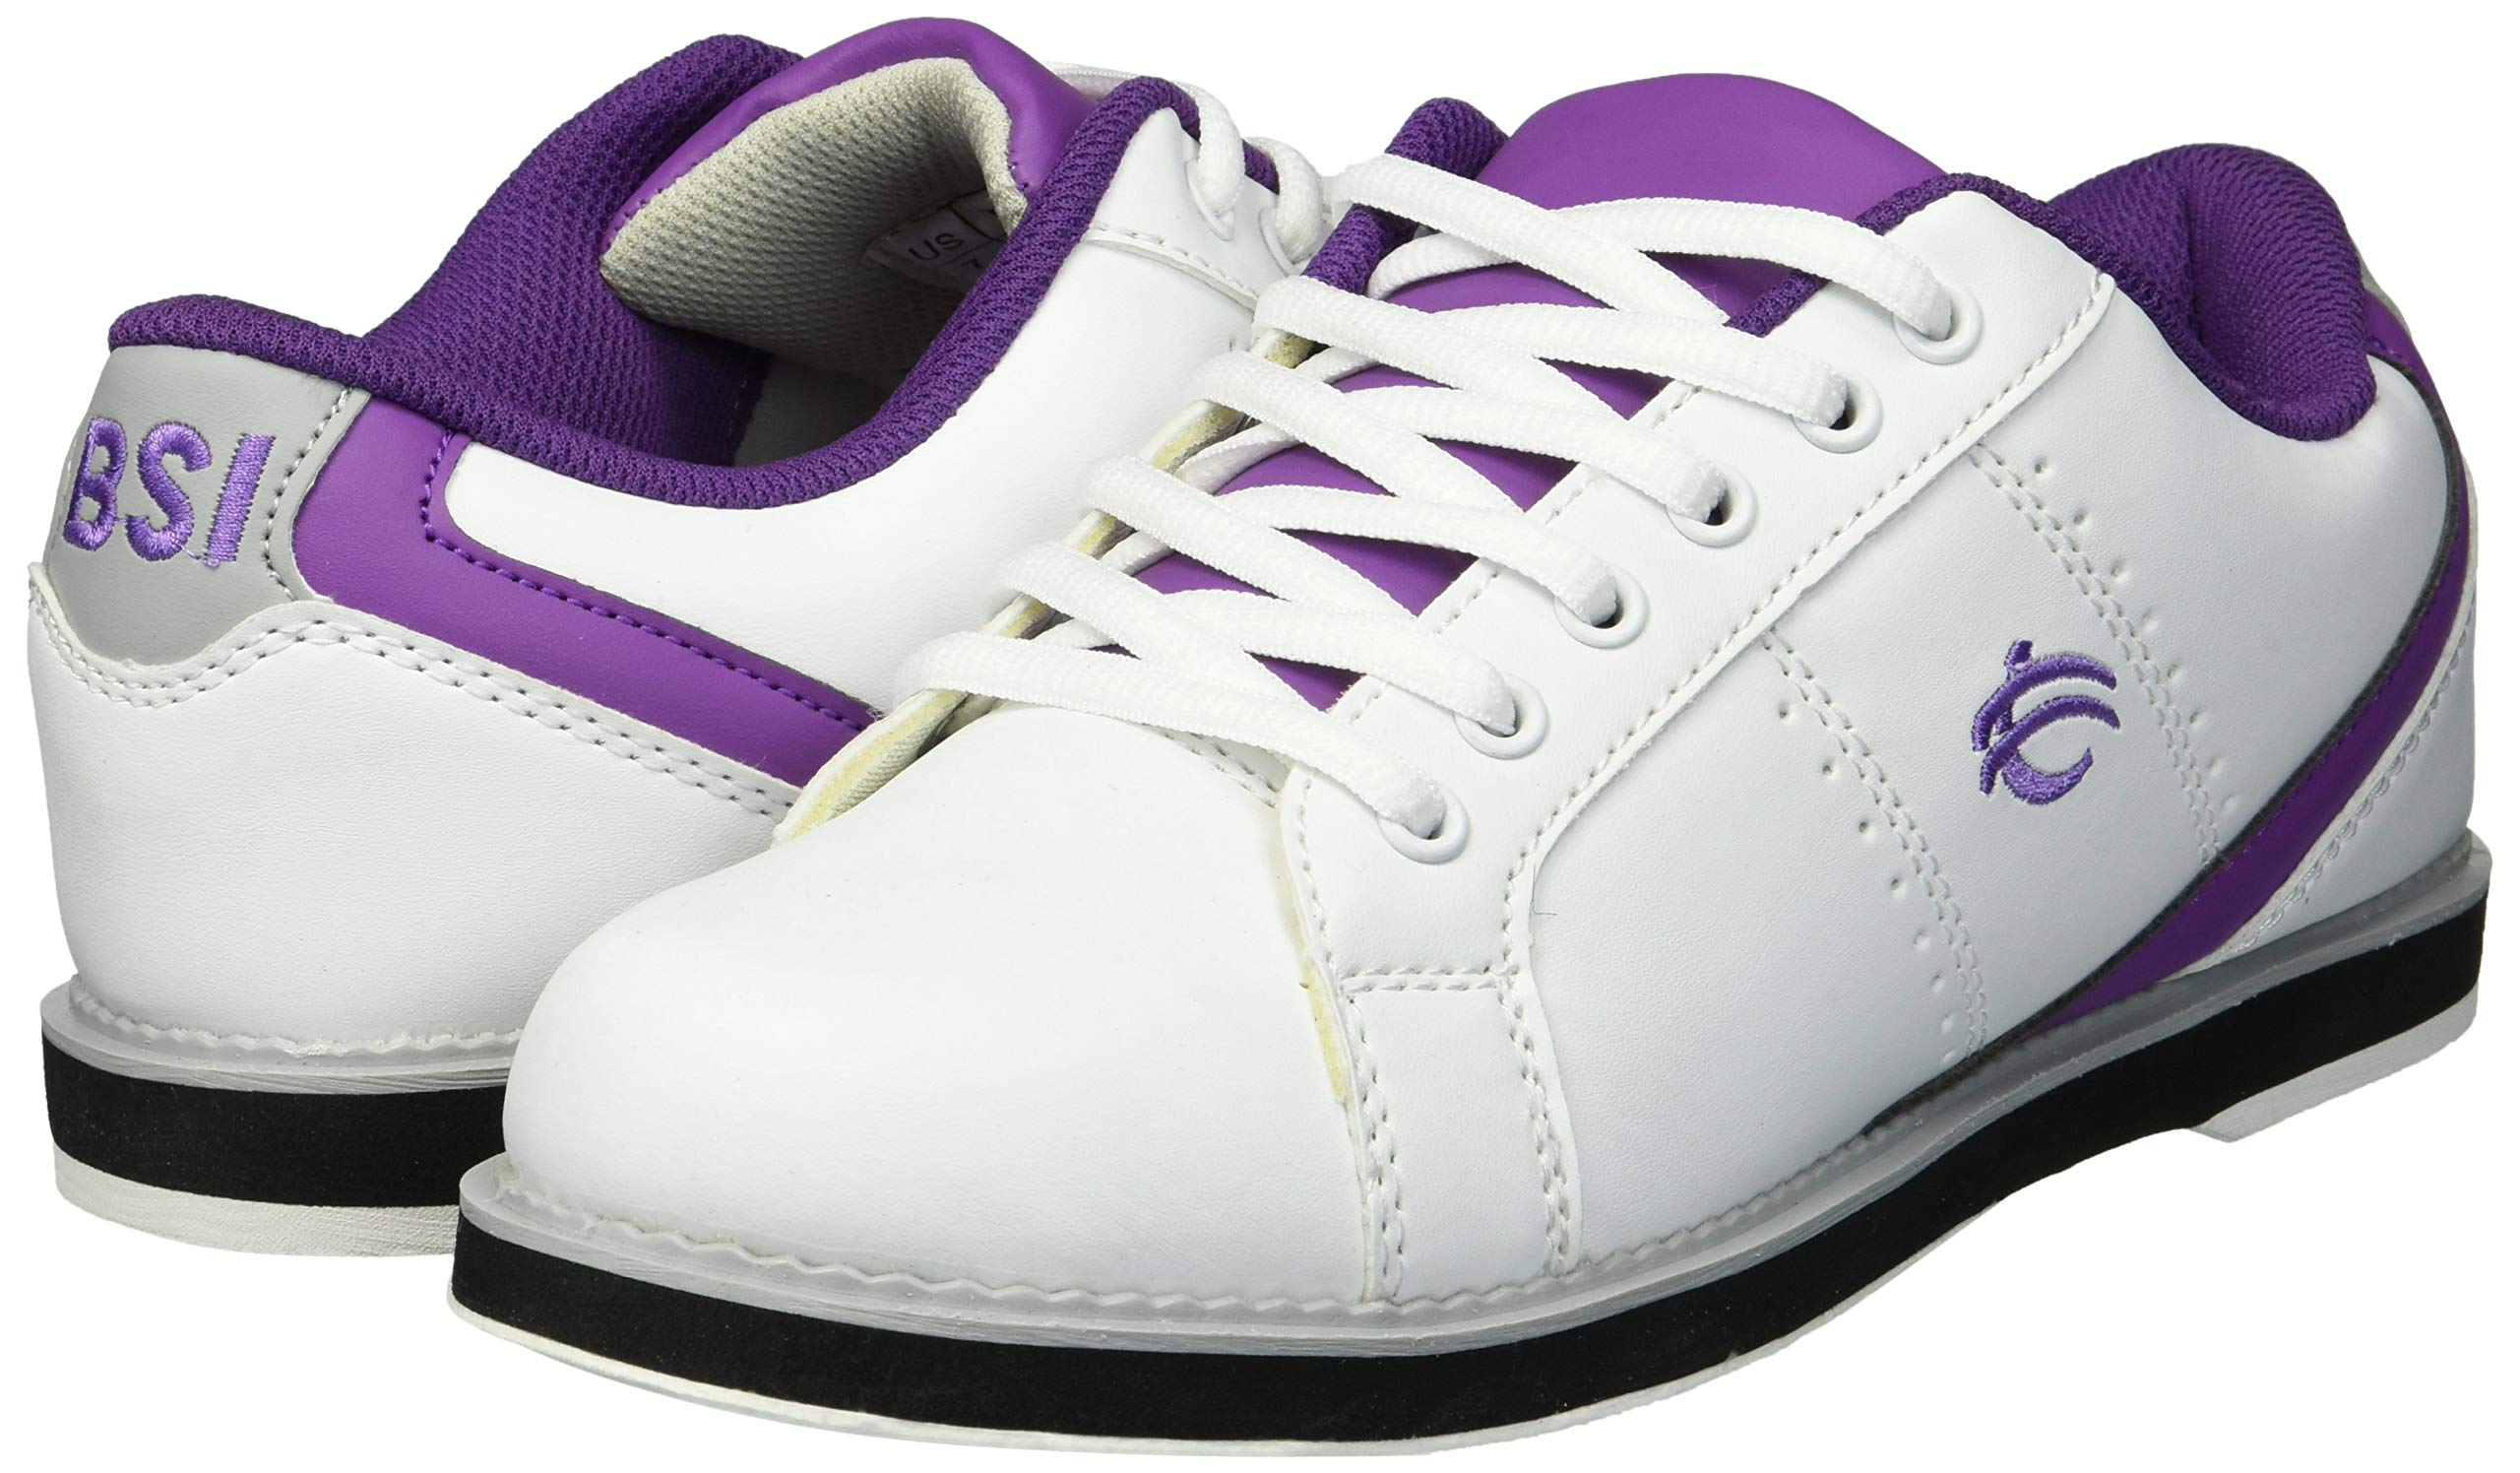 BSI Women's 460 Bowling Shoe, White/Purple, Size 10 by BSI (Image #5)